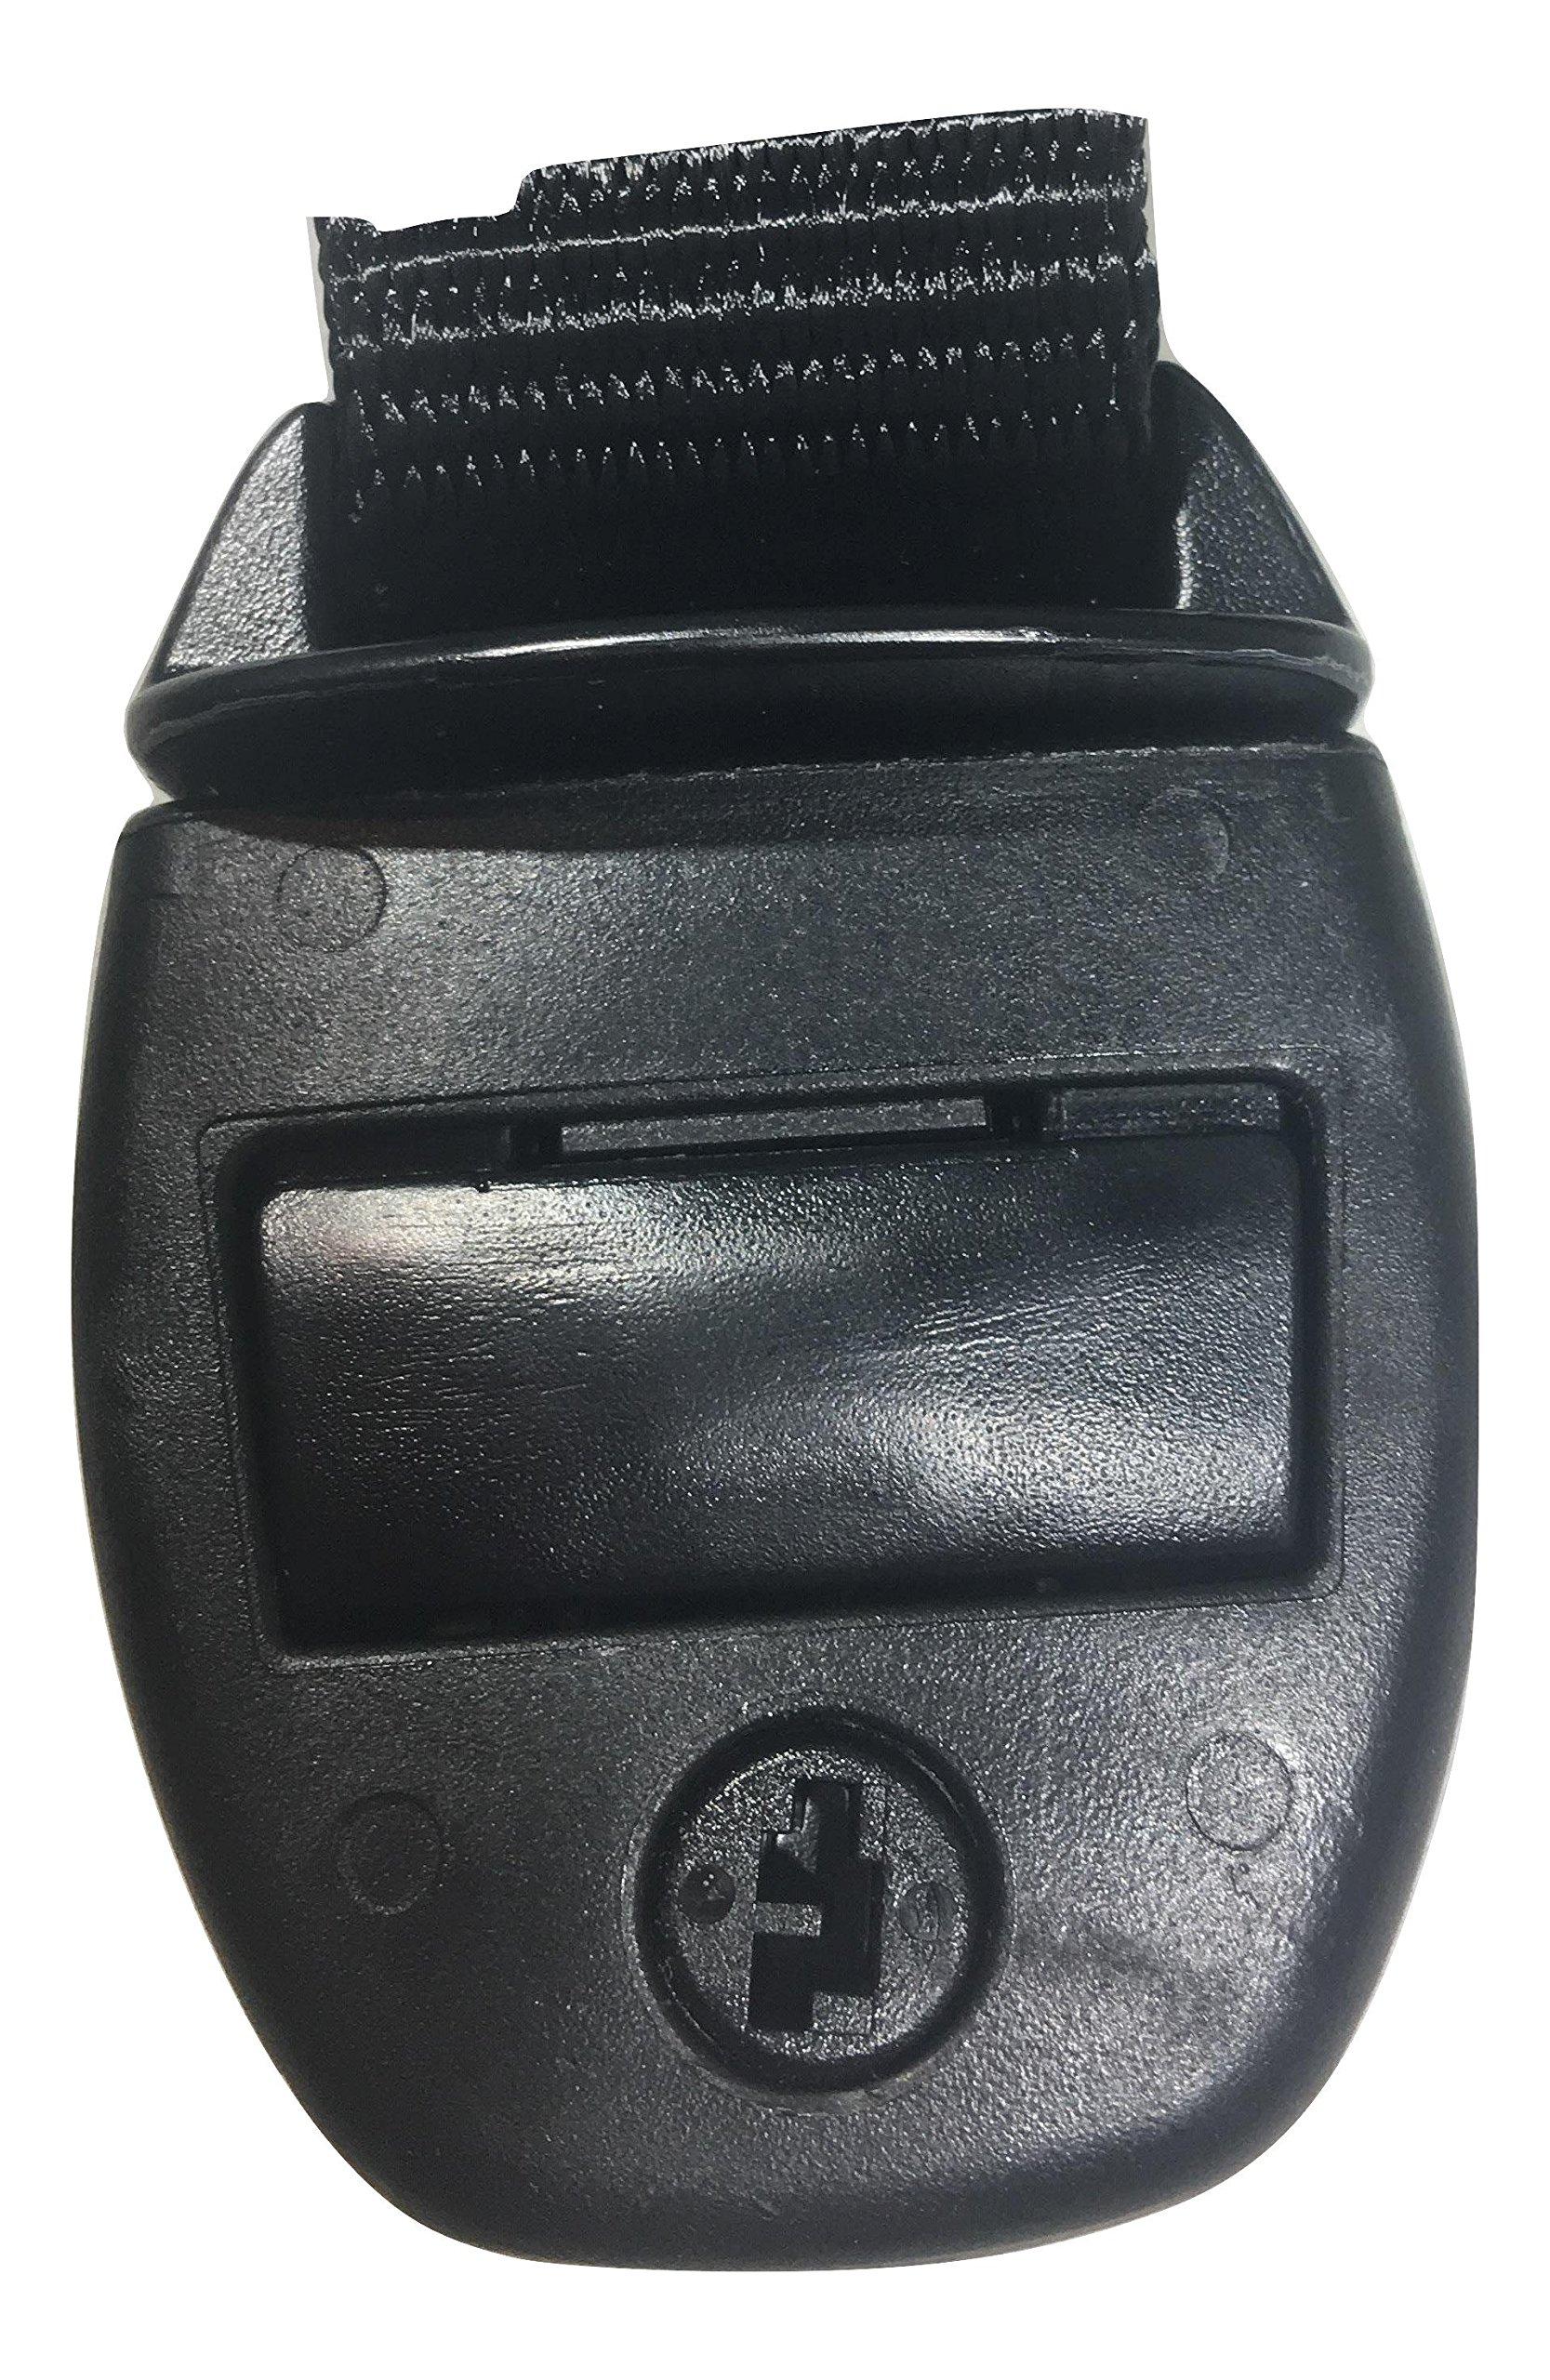 RatchetStrap.Com Nexus Locking Center Release Spa Hot Tub Cover Adjustable Wind Straps Black 8 Ft.